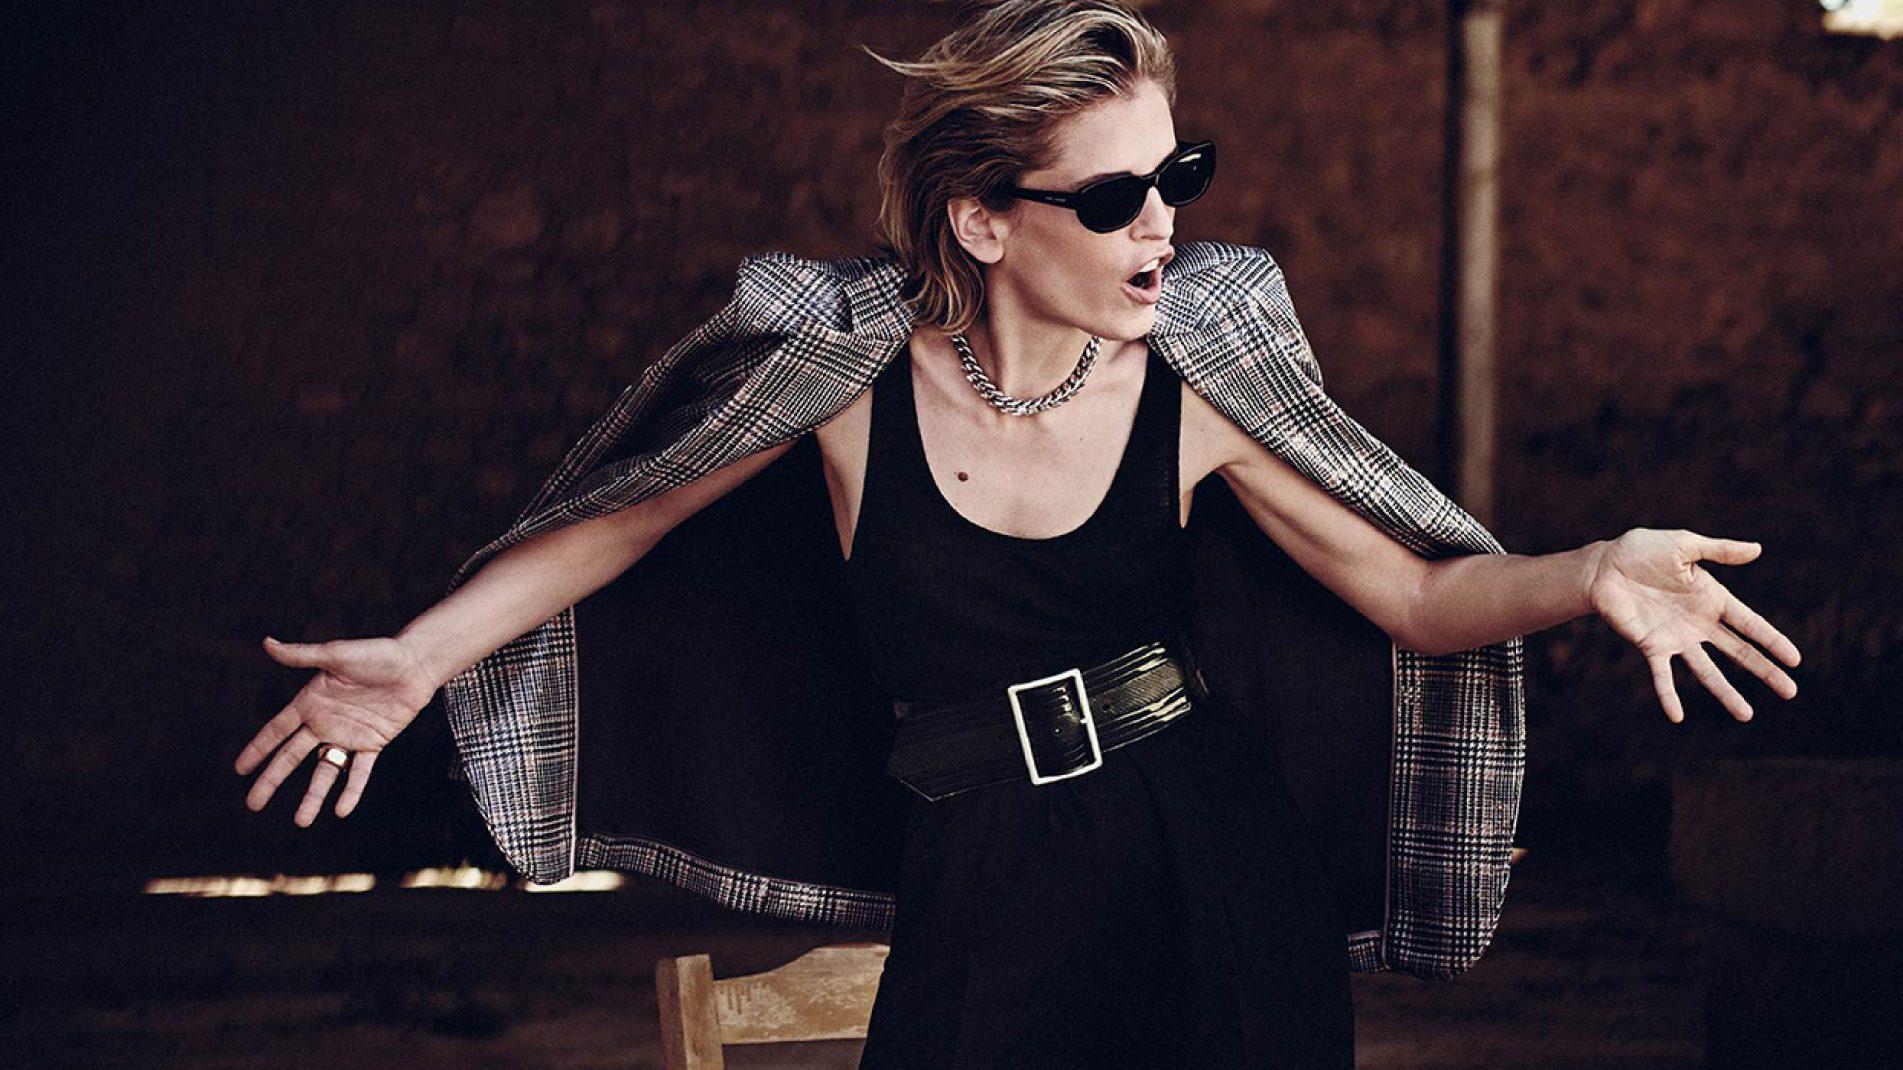 First Cover | Cover Star: Denise Gough | Boo George: Photographer | Daniela Agnelli: Fashion Editor